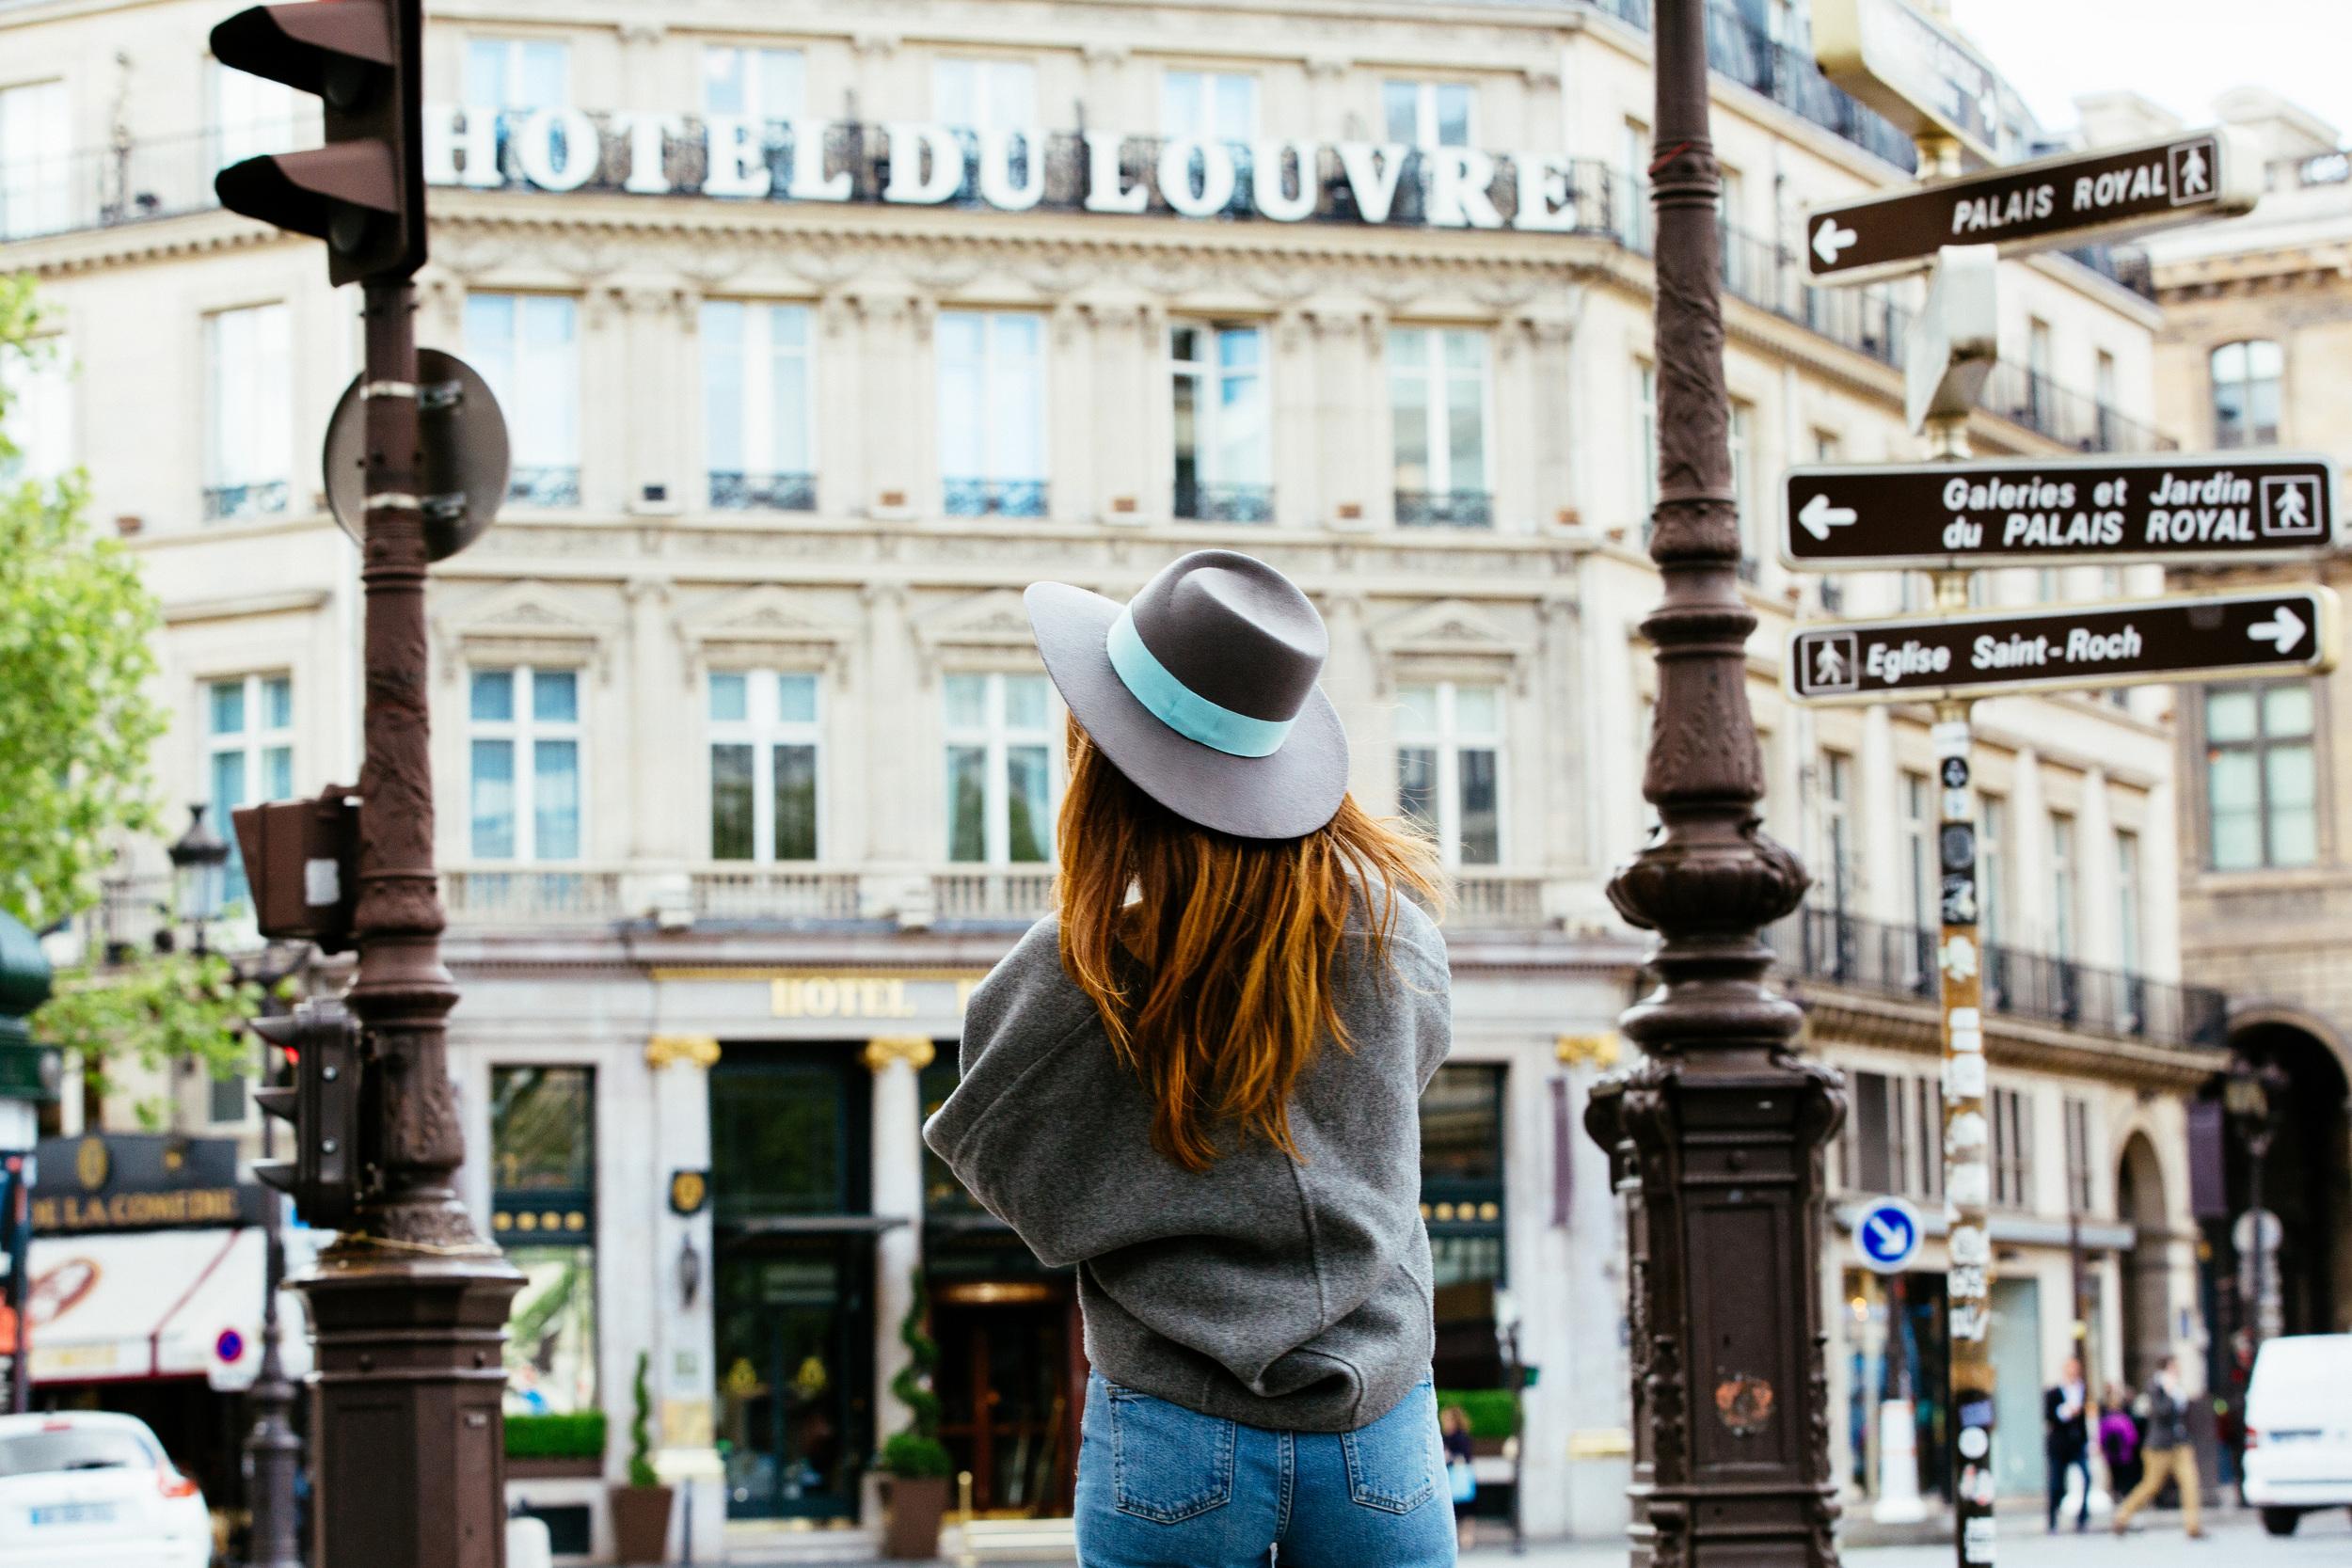 Photographer in Paris, Hotel du Louvre, portrait, Brand, Lookbook, Iheartparisfr